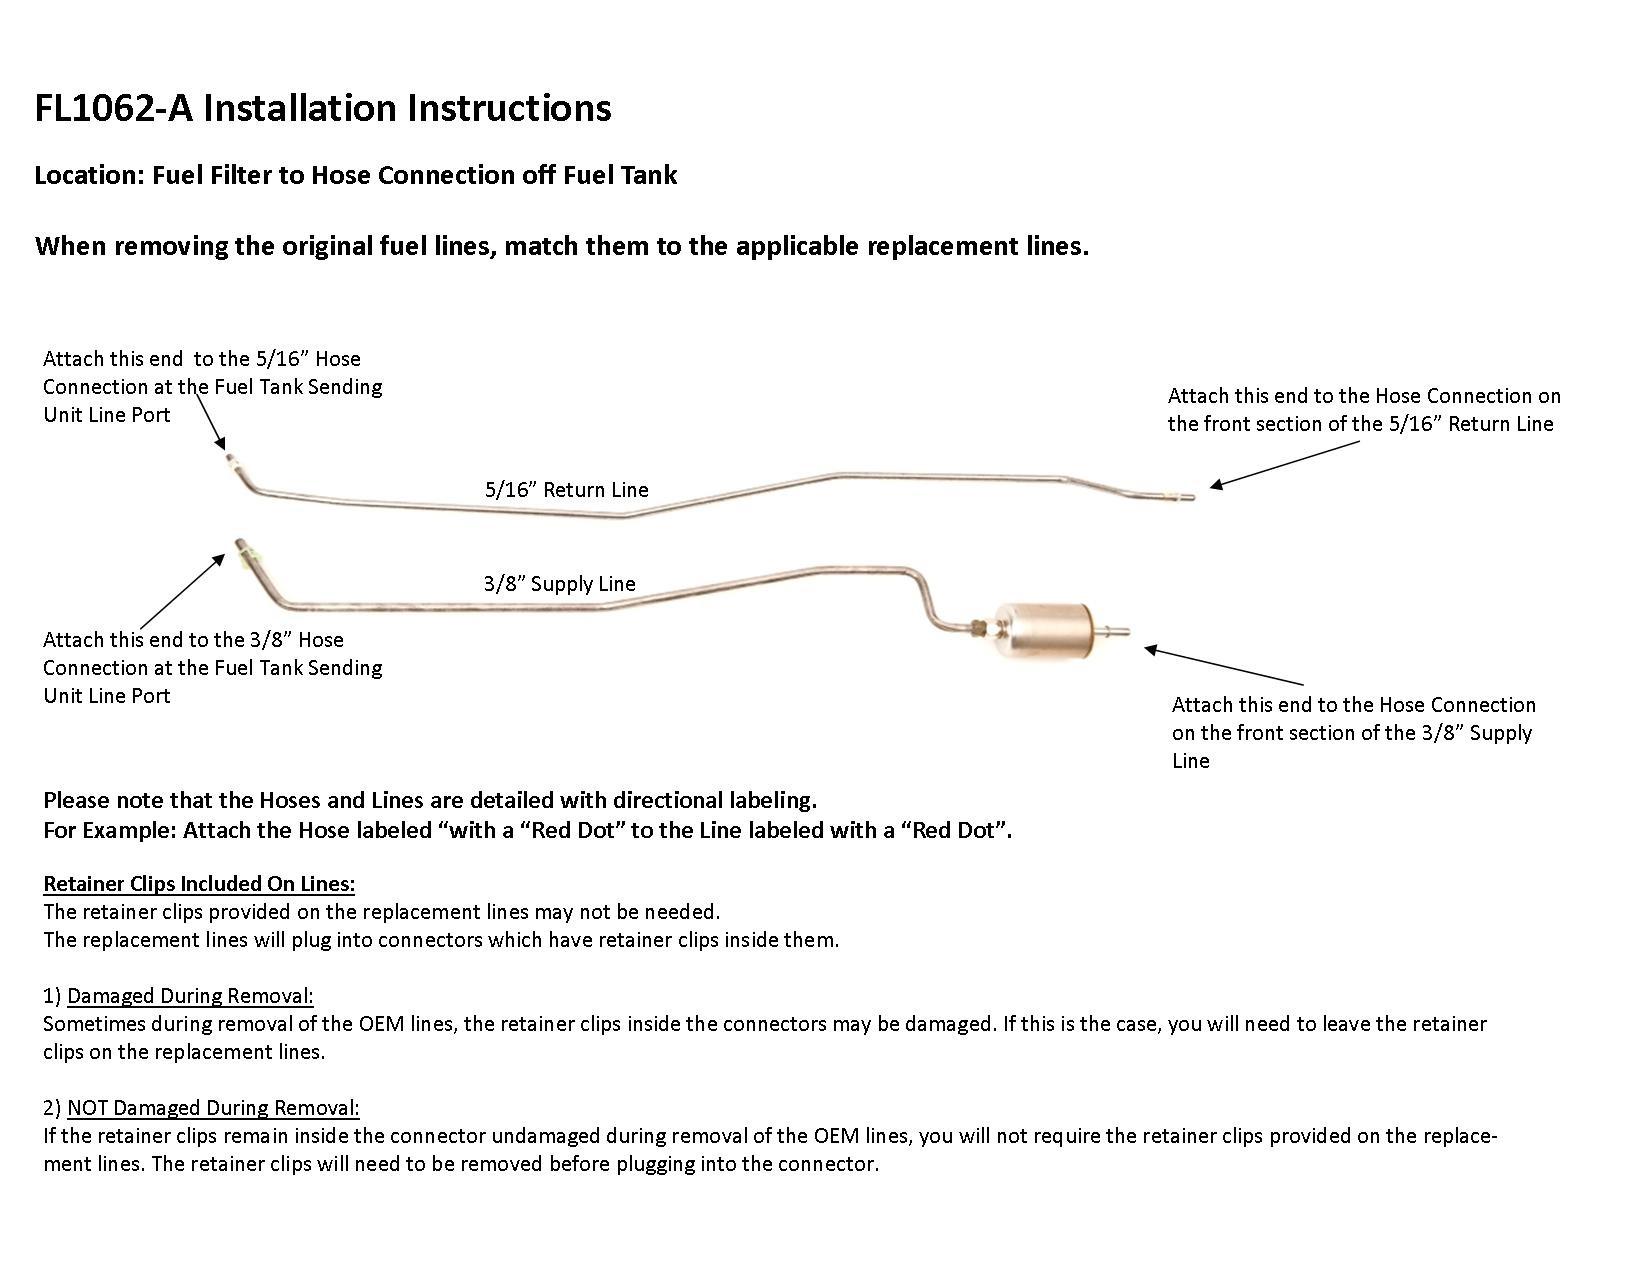 97-00-s10-sonoma-installation-instruction-fl1062-a.jpg